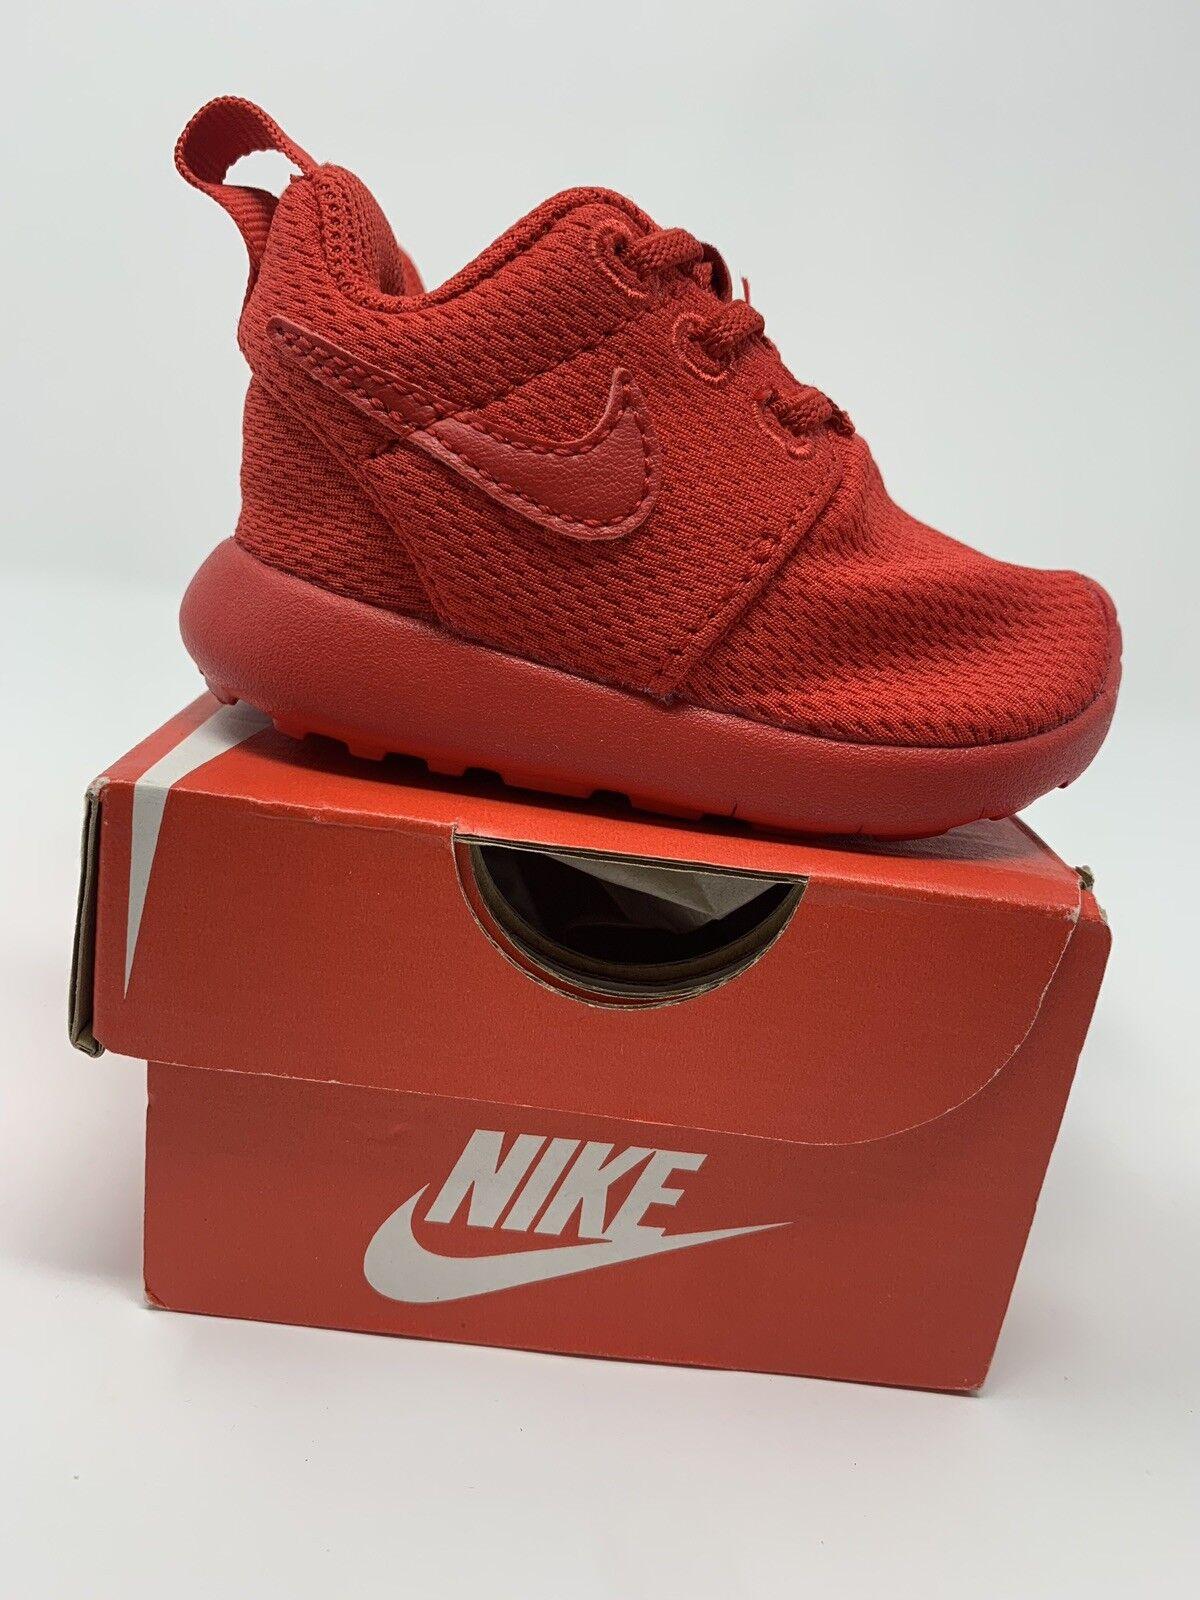 Nike Infant/&Toddler AIR TURF RAIDER Shoes Laser Crimson 599815-600 a2